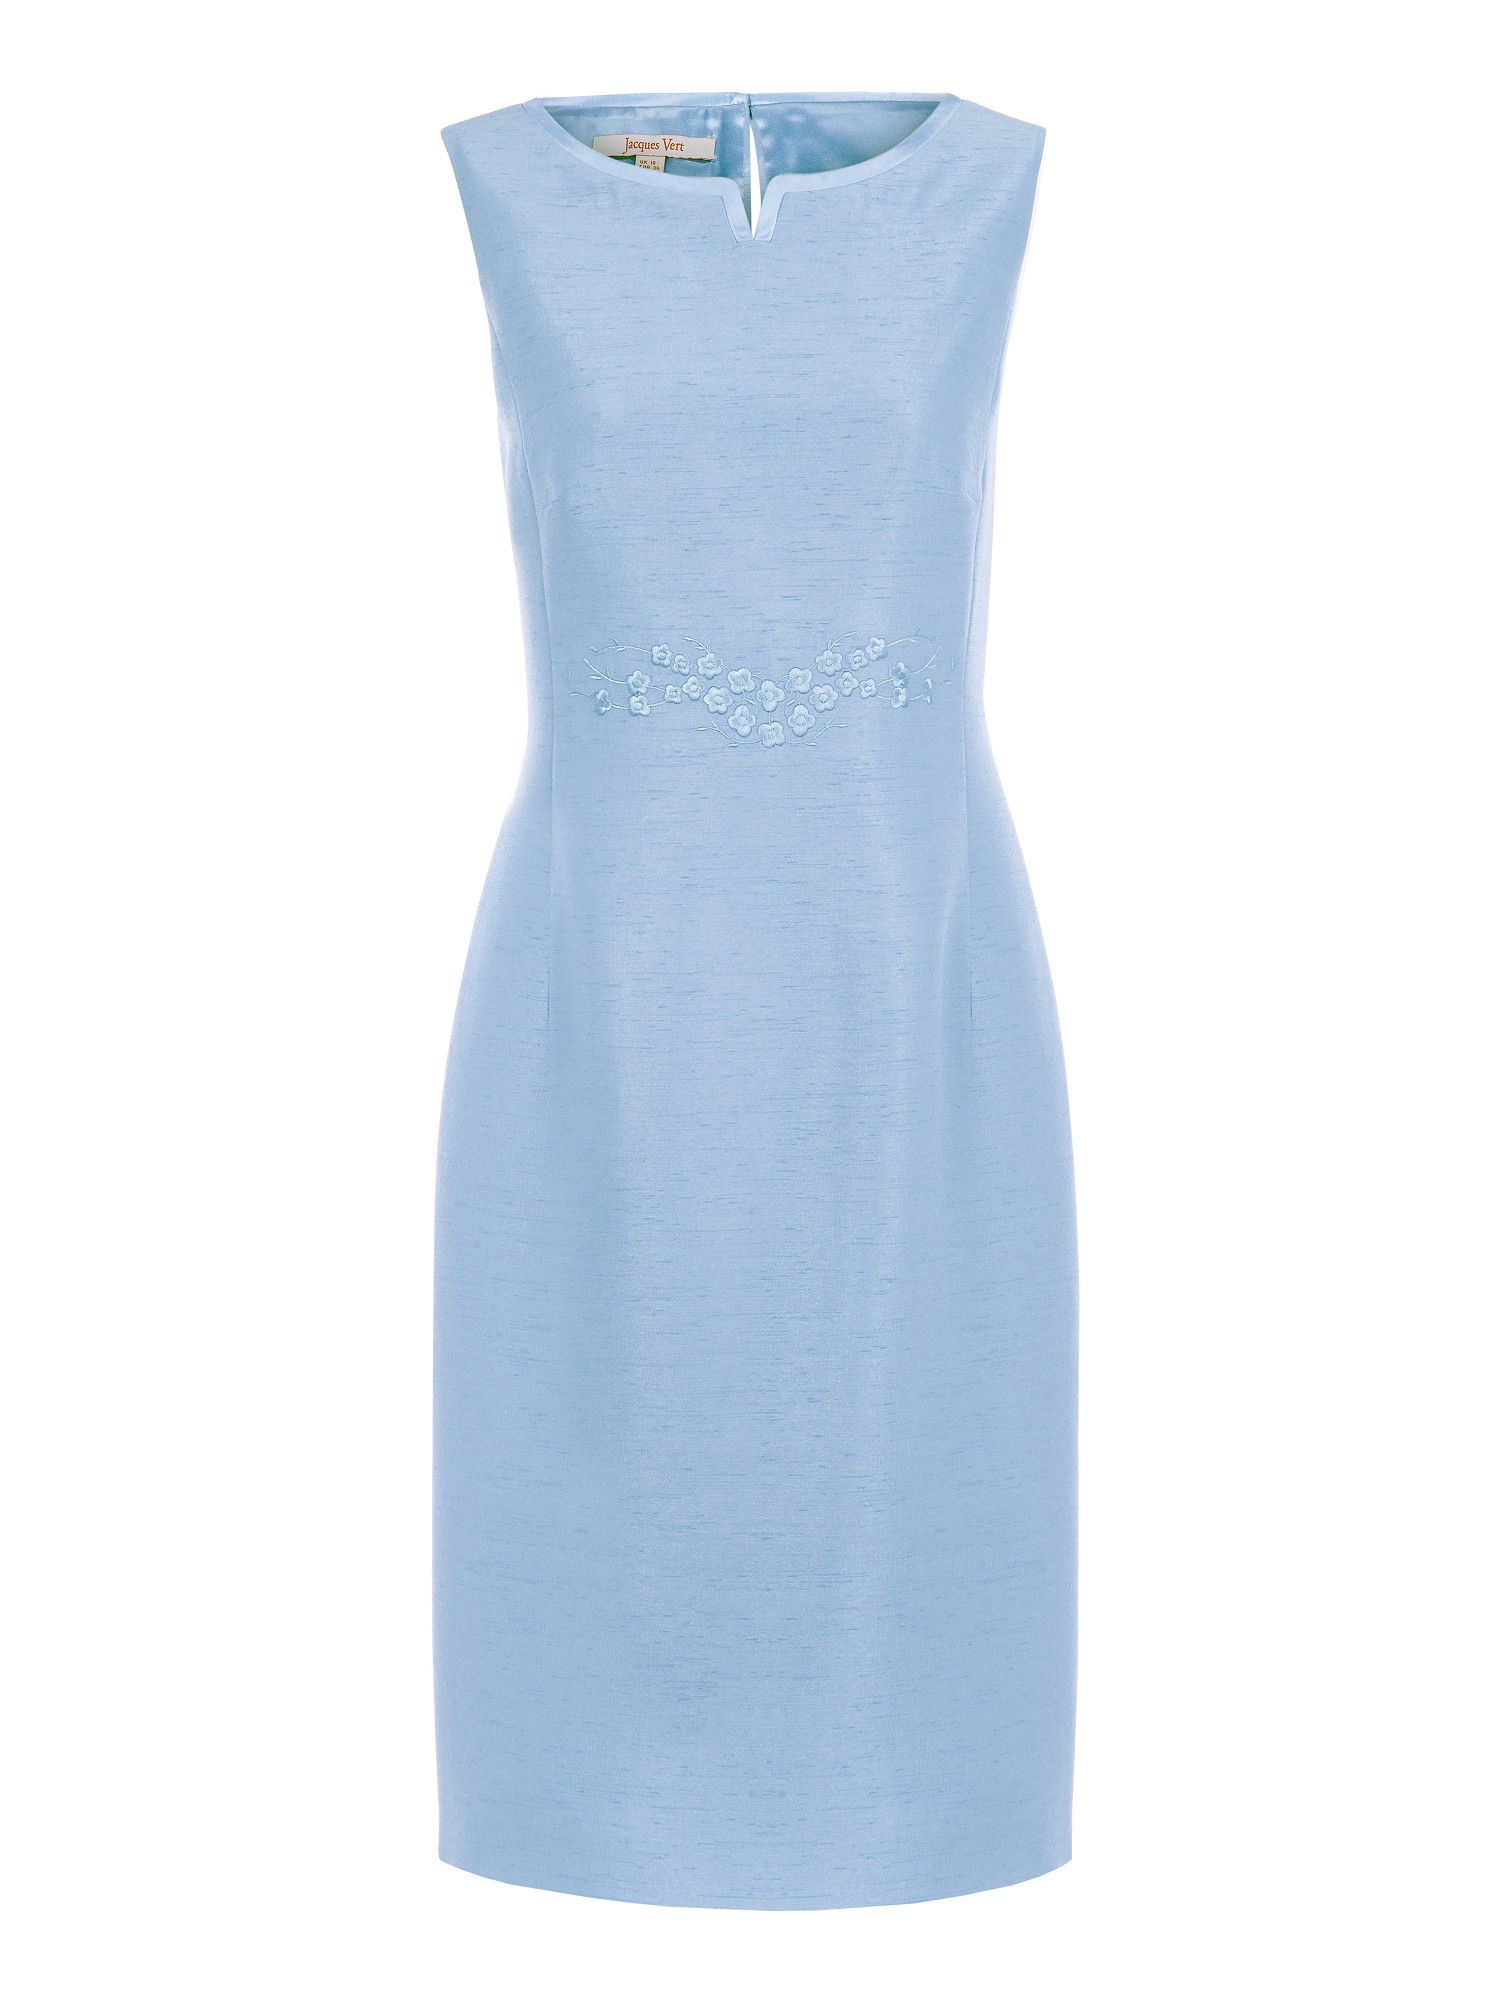 Dolce And Gabana Light Blue Jacques Vert Cornflower Shift Dress in Blue (light blue ...